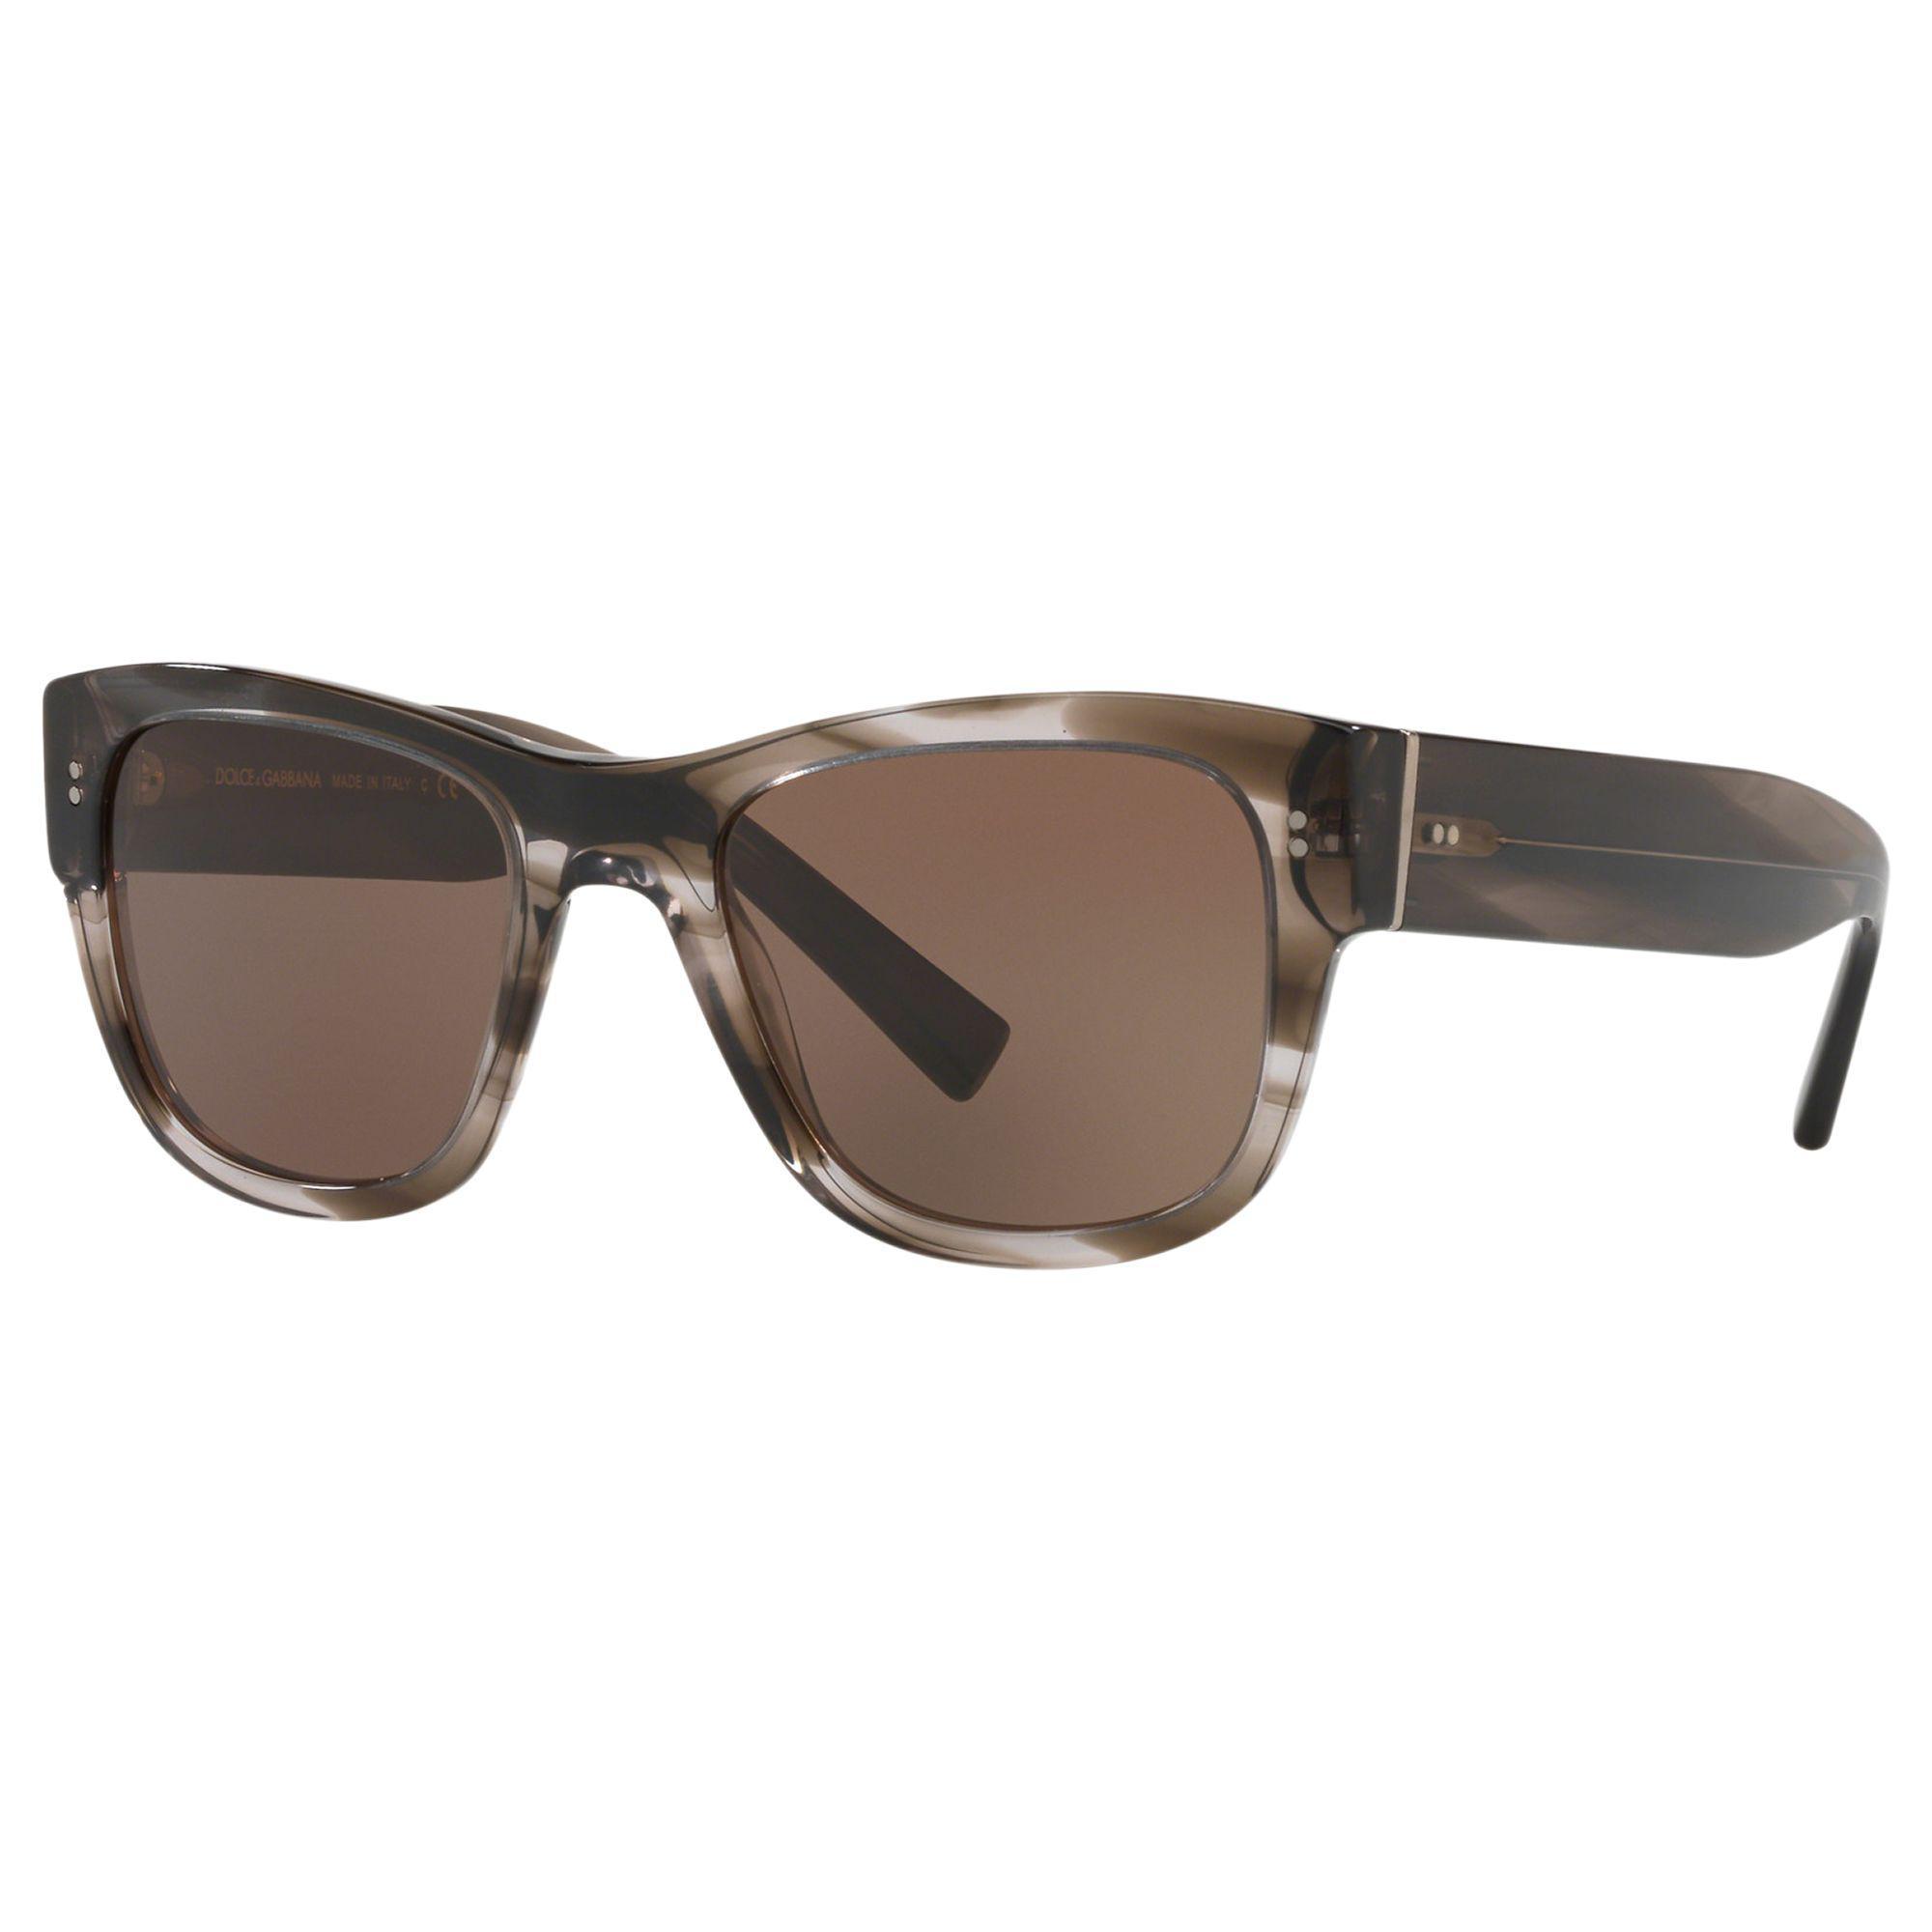 200f43d3d8 Dolce   Gabbana Dg4338 Men s Square Sunglasses in Brown for Men - Lyst